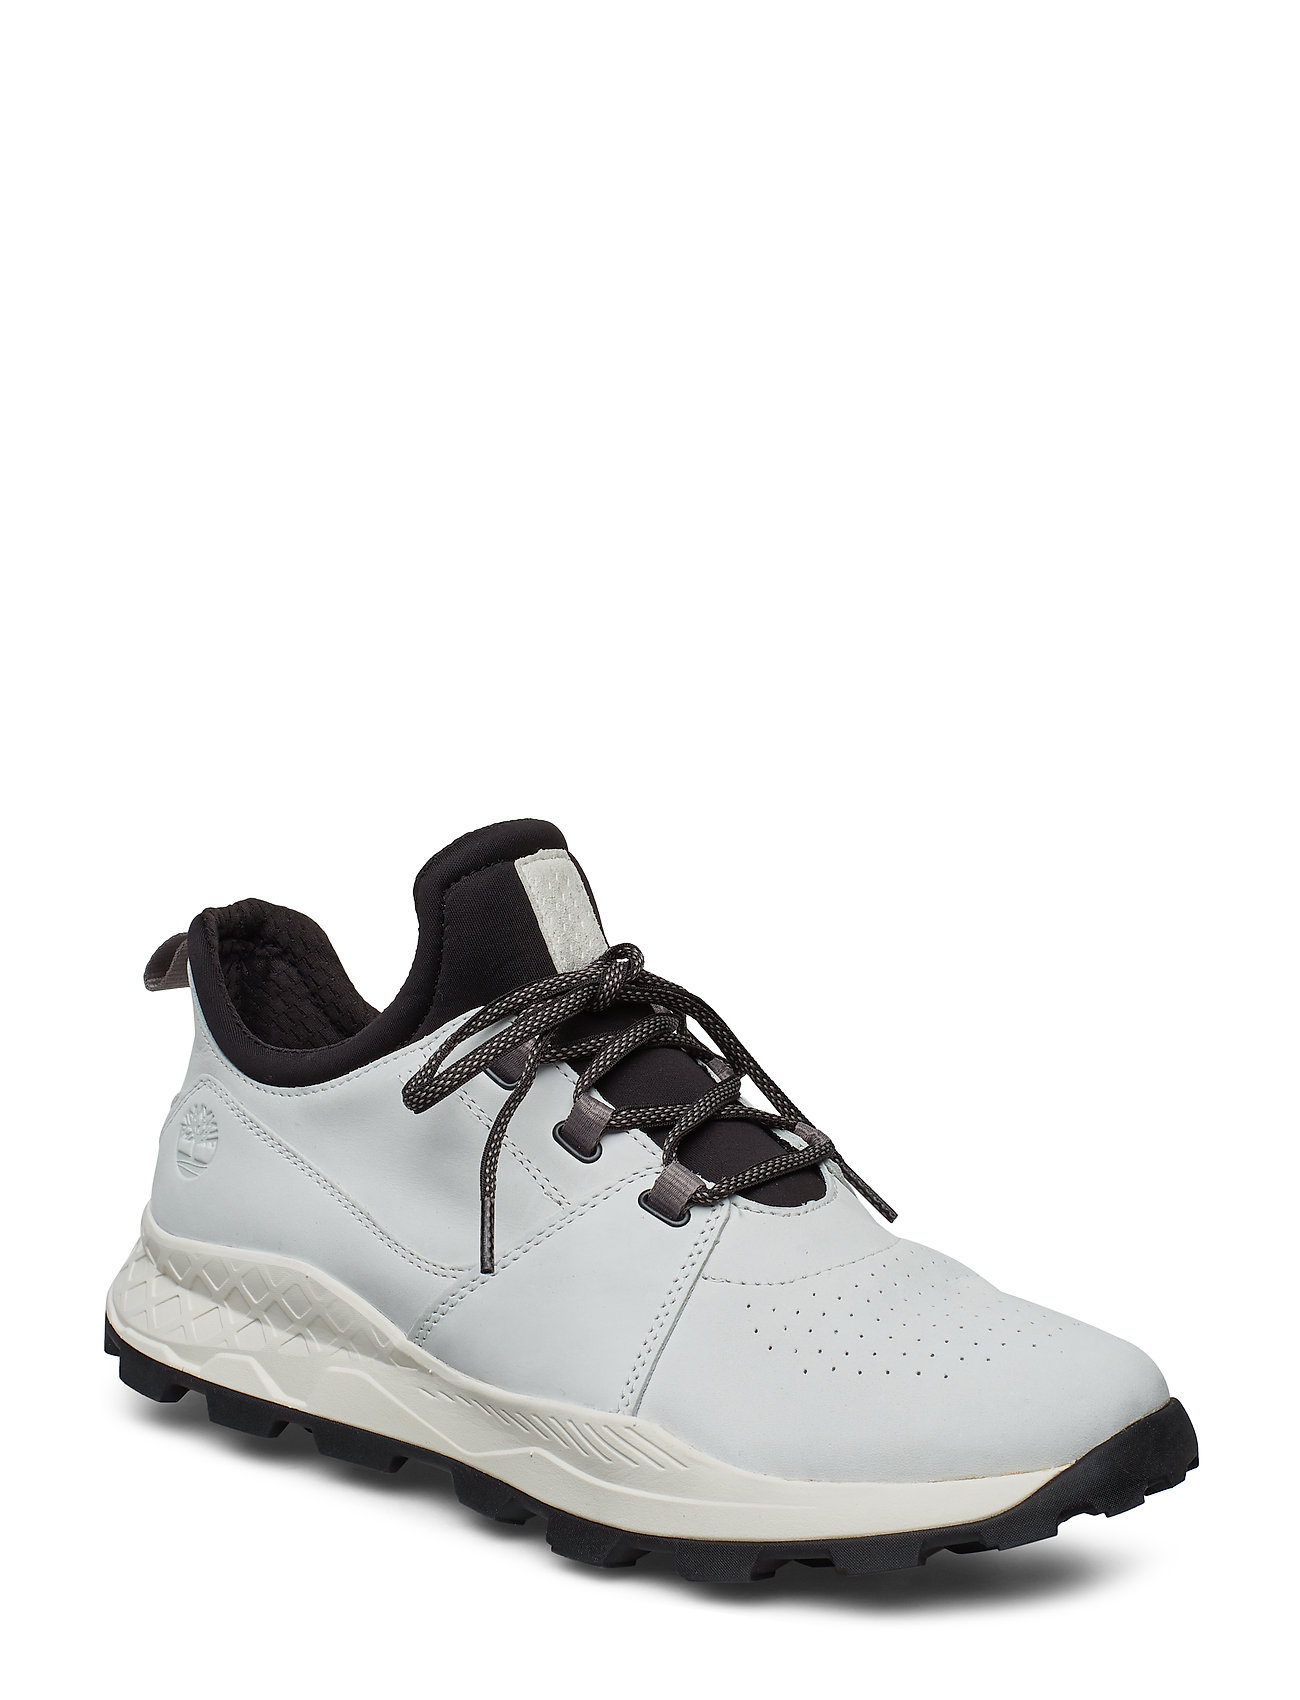 TIMBERLAND Brooklyn Lace Oxford Niedrige Sneaker Weiß TIMBERLAND